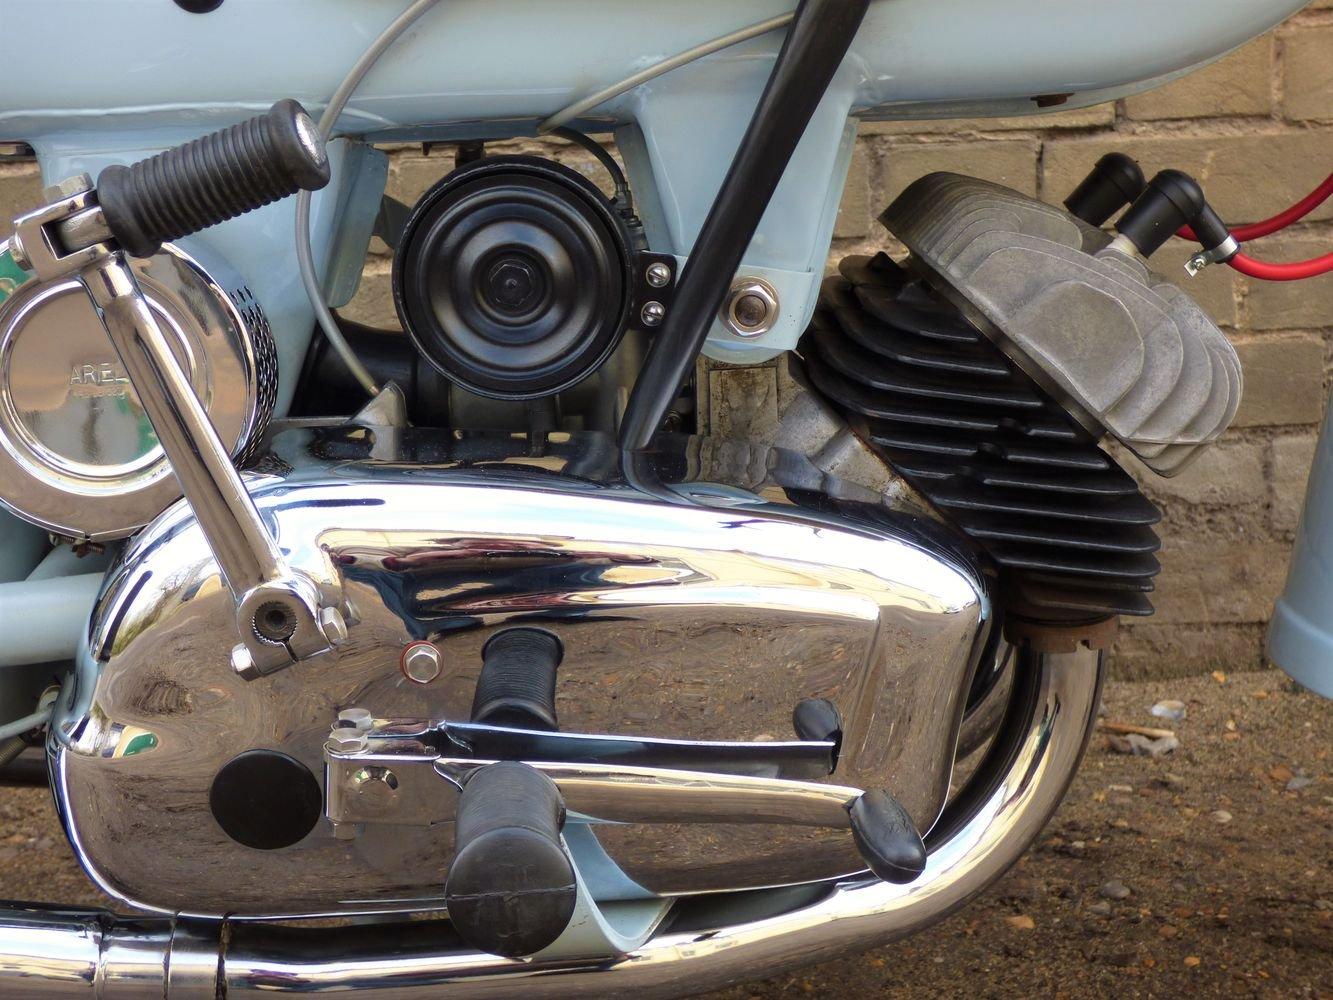 1961 Ariel 'Golden' Arrow Super Sports 250cc SOLD (picture 4 of 6)